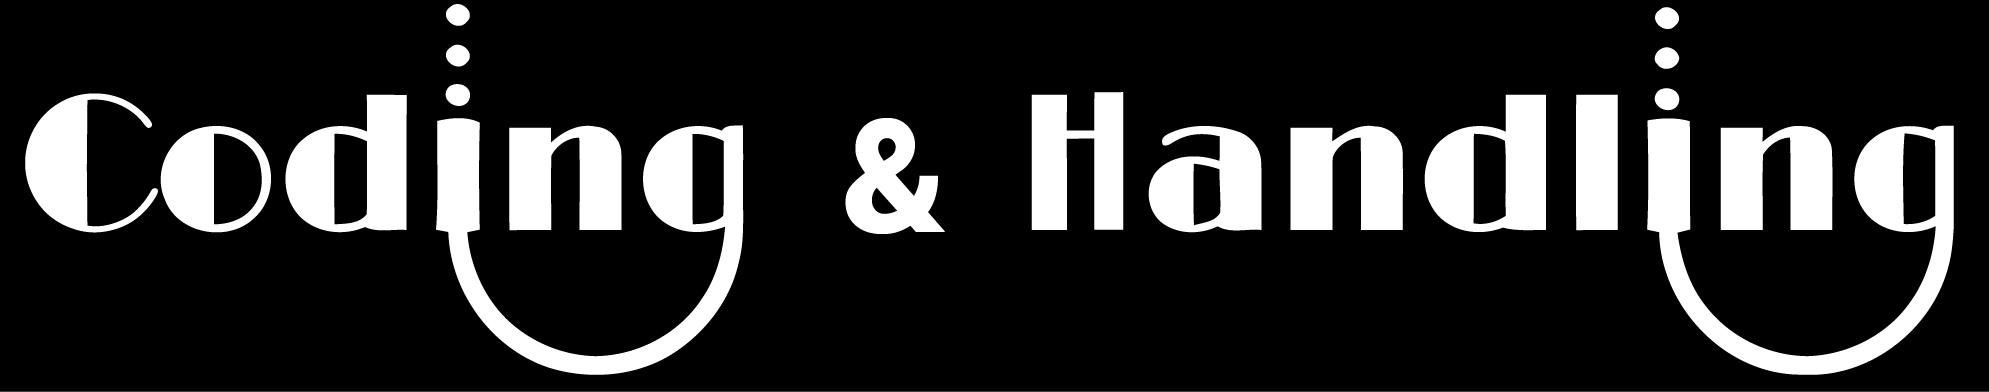 Coding & Handling